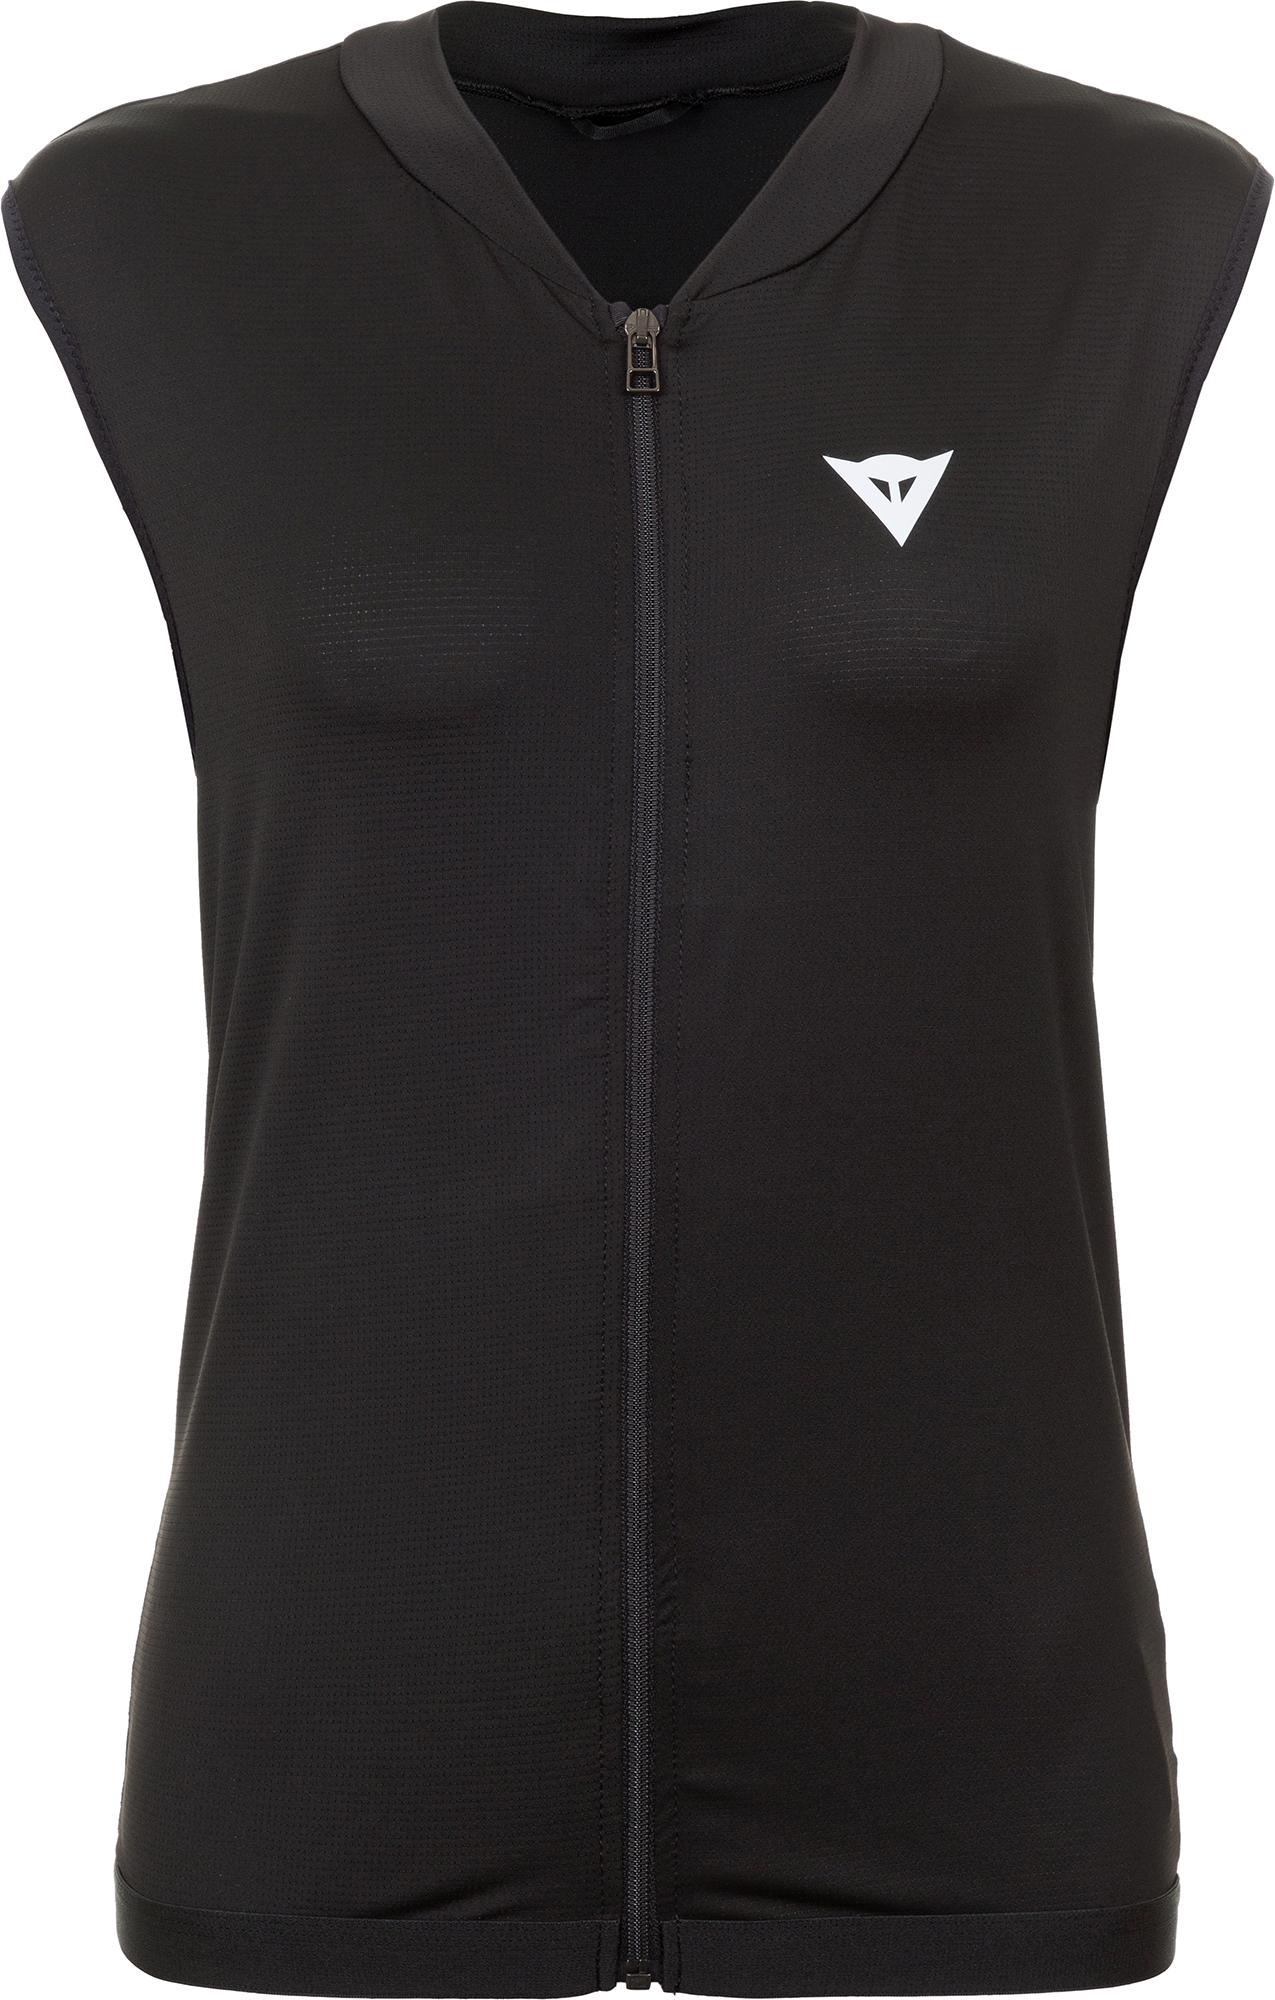 цена на Dainese Жилет защитный Dainese Flexagon Waistcoat Lite